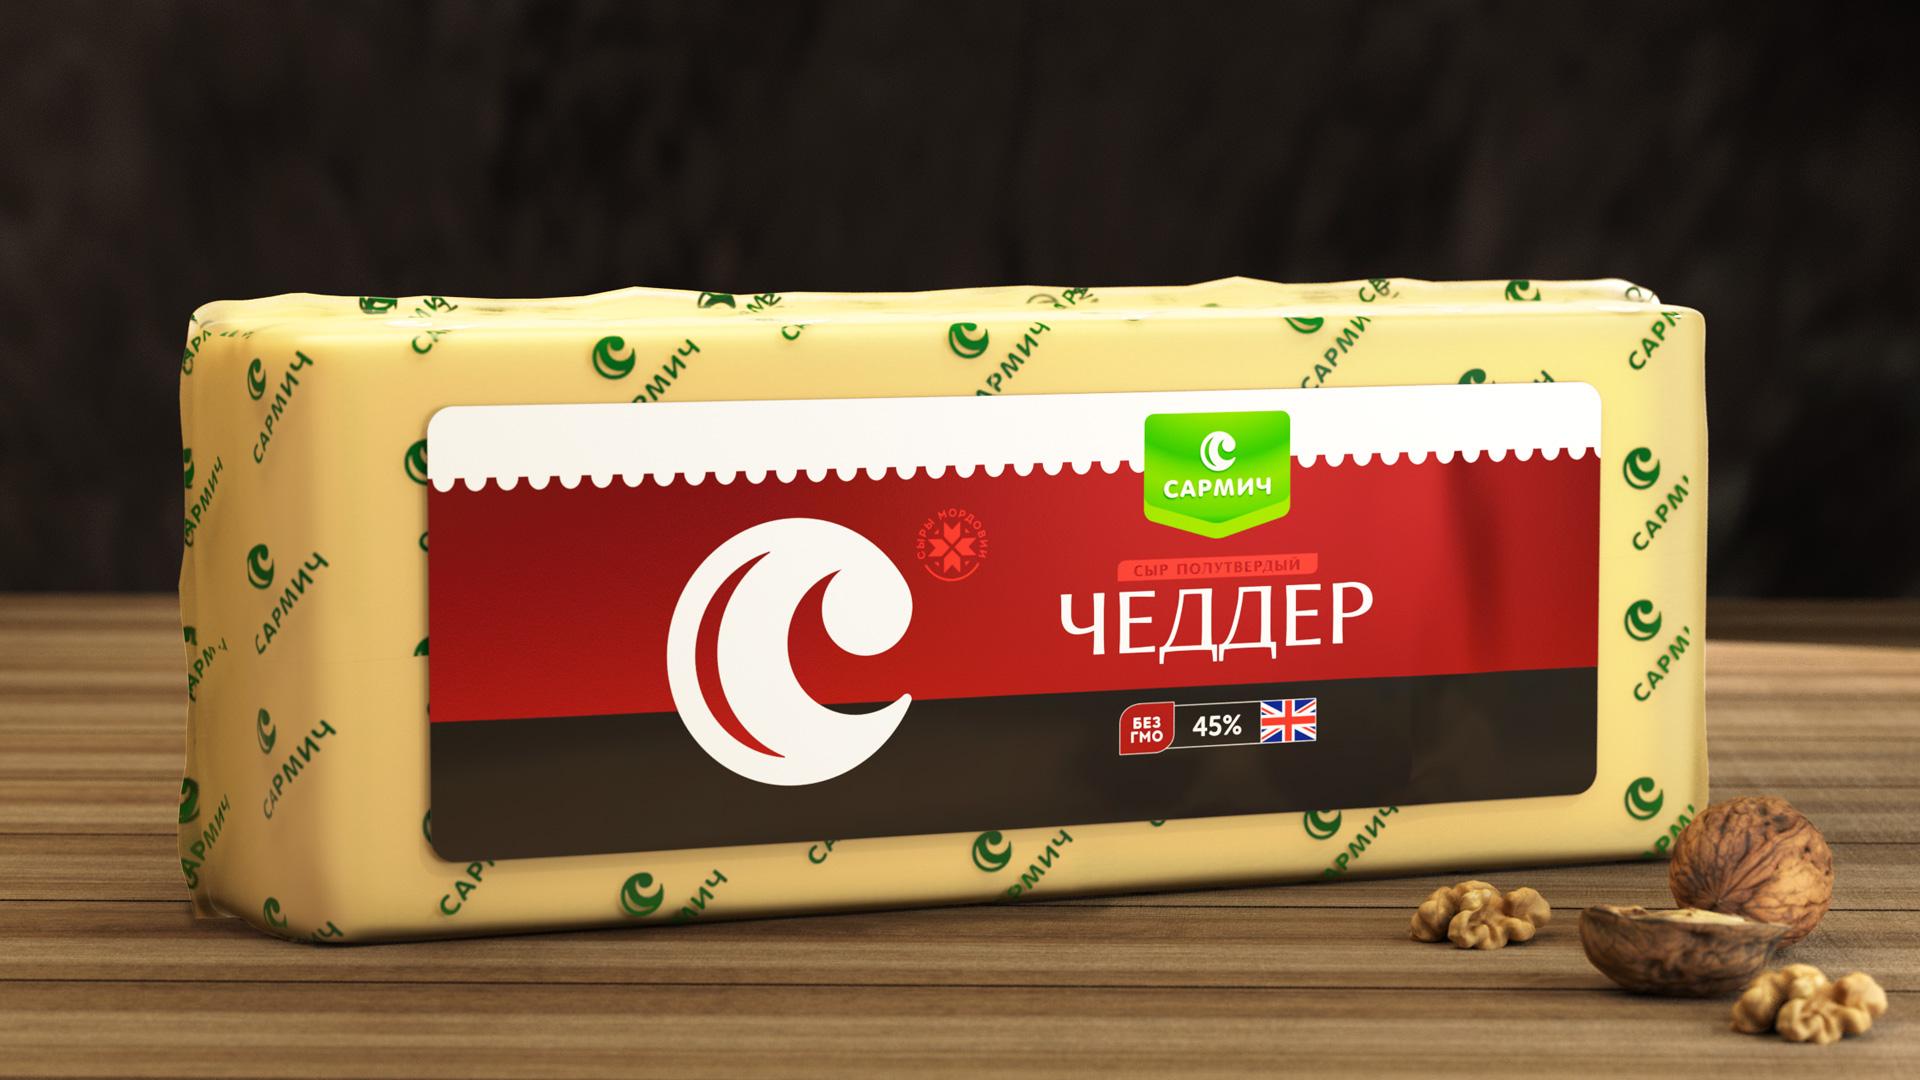 Cheddar cheese, Sarmich, Asgard branding, packaging, trademark, package design, cheese design, label